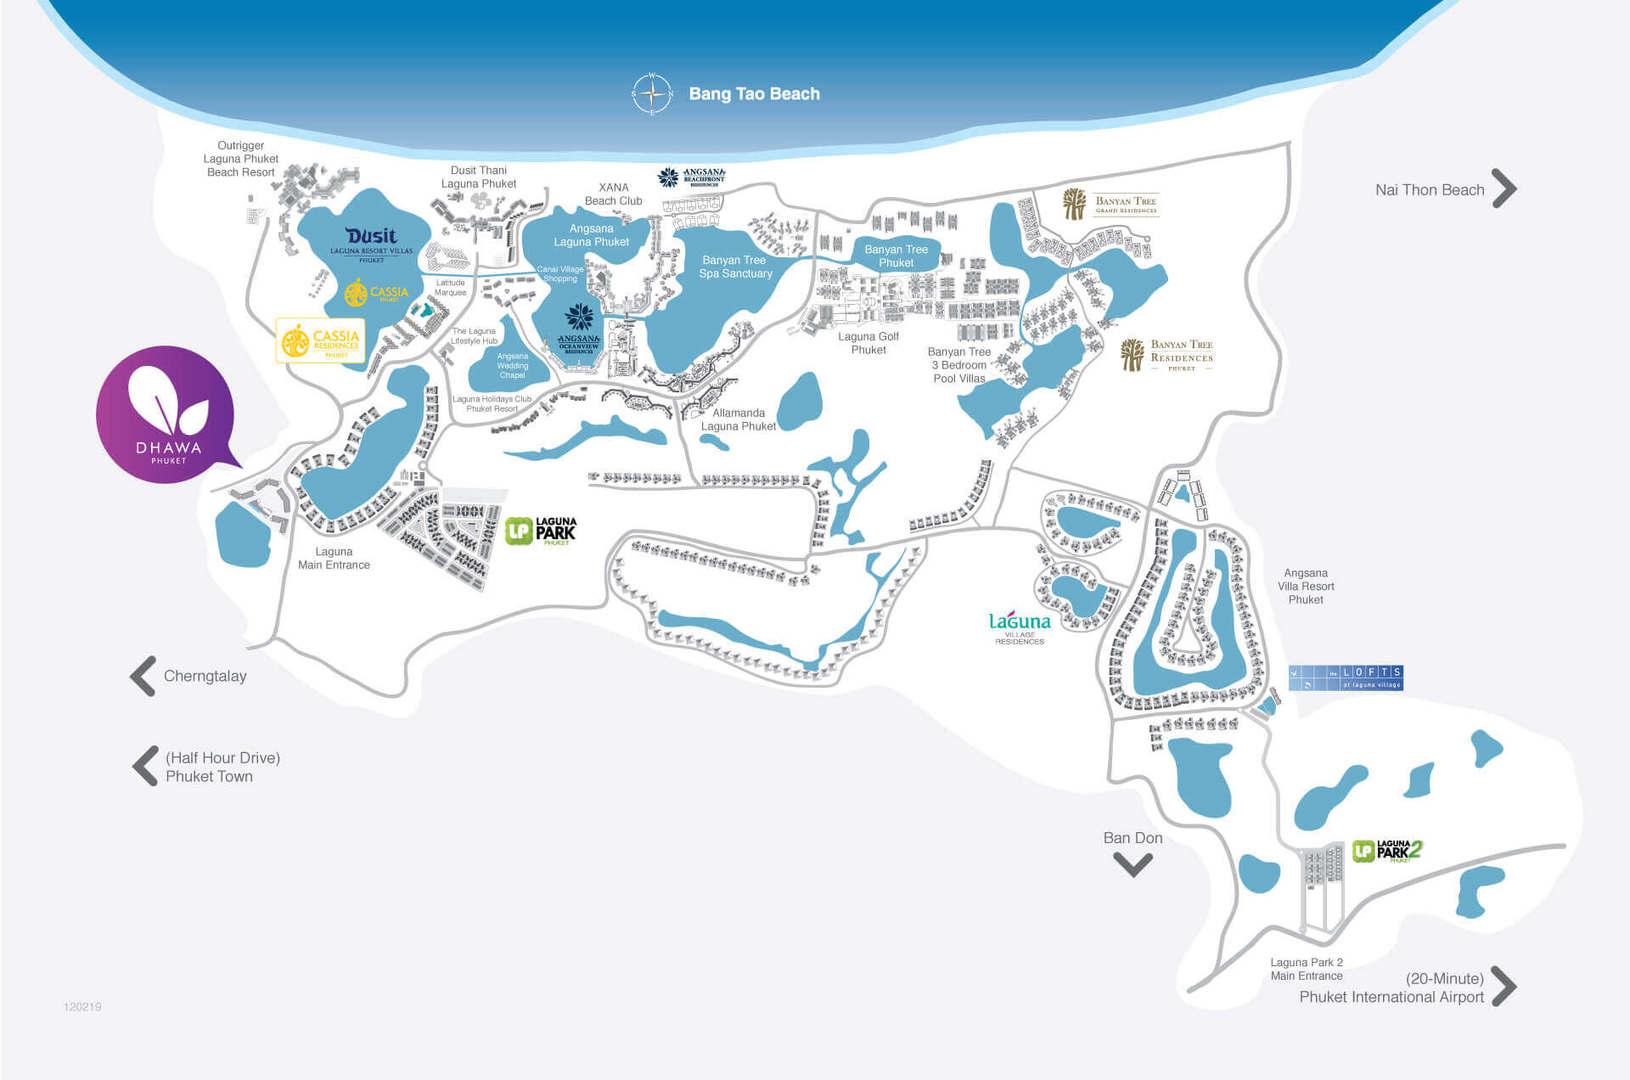 Map of Dhawa Phuket